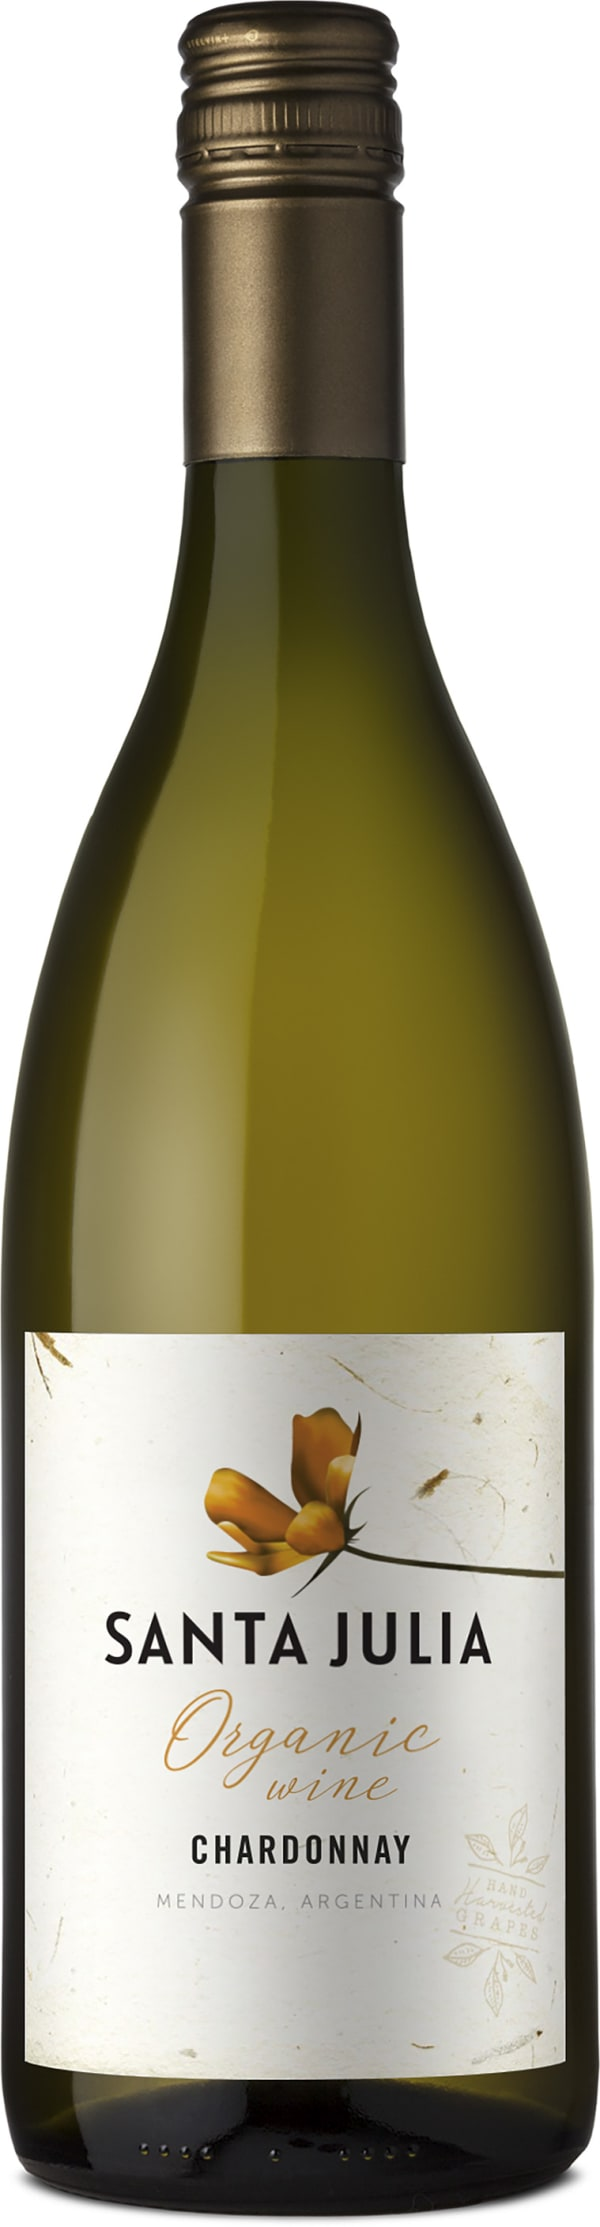 Santa Julia Organic Chardonnay